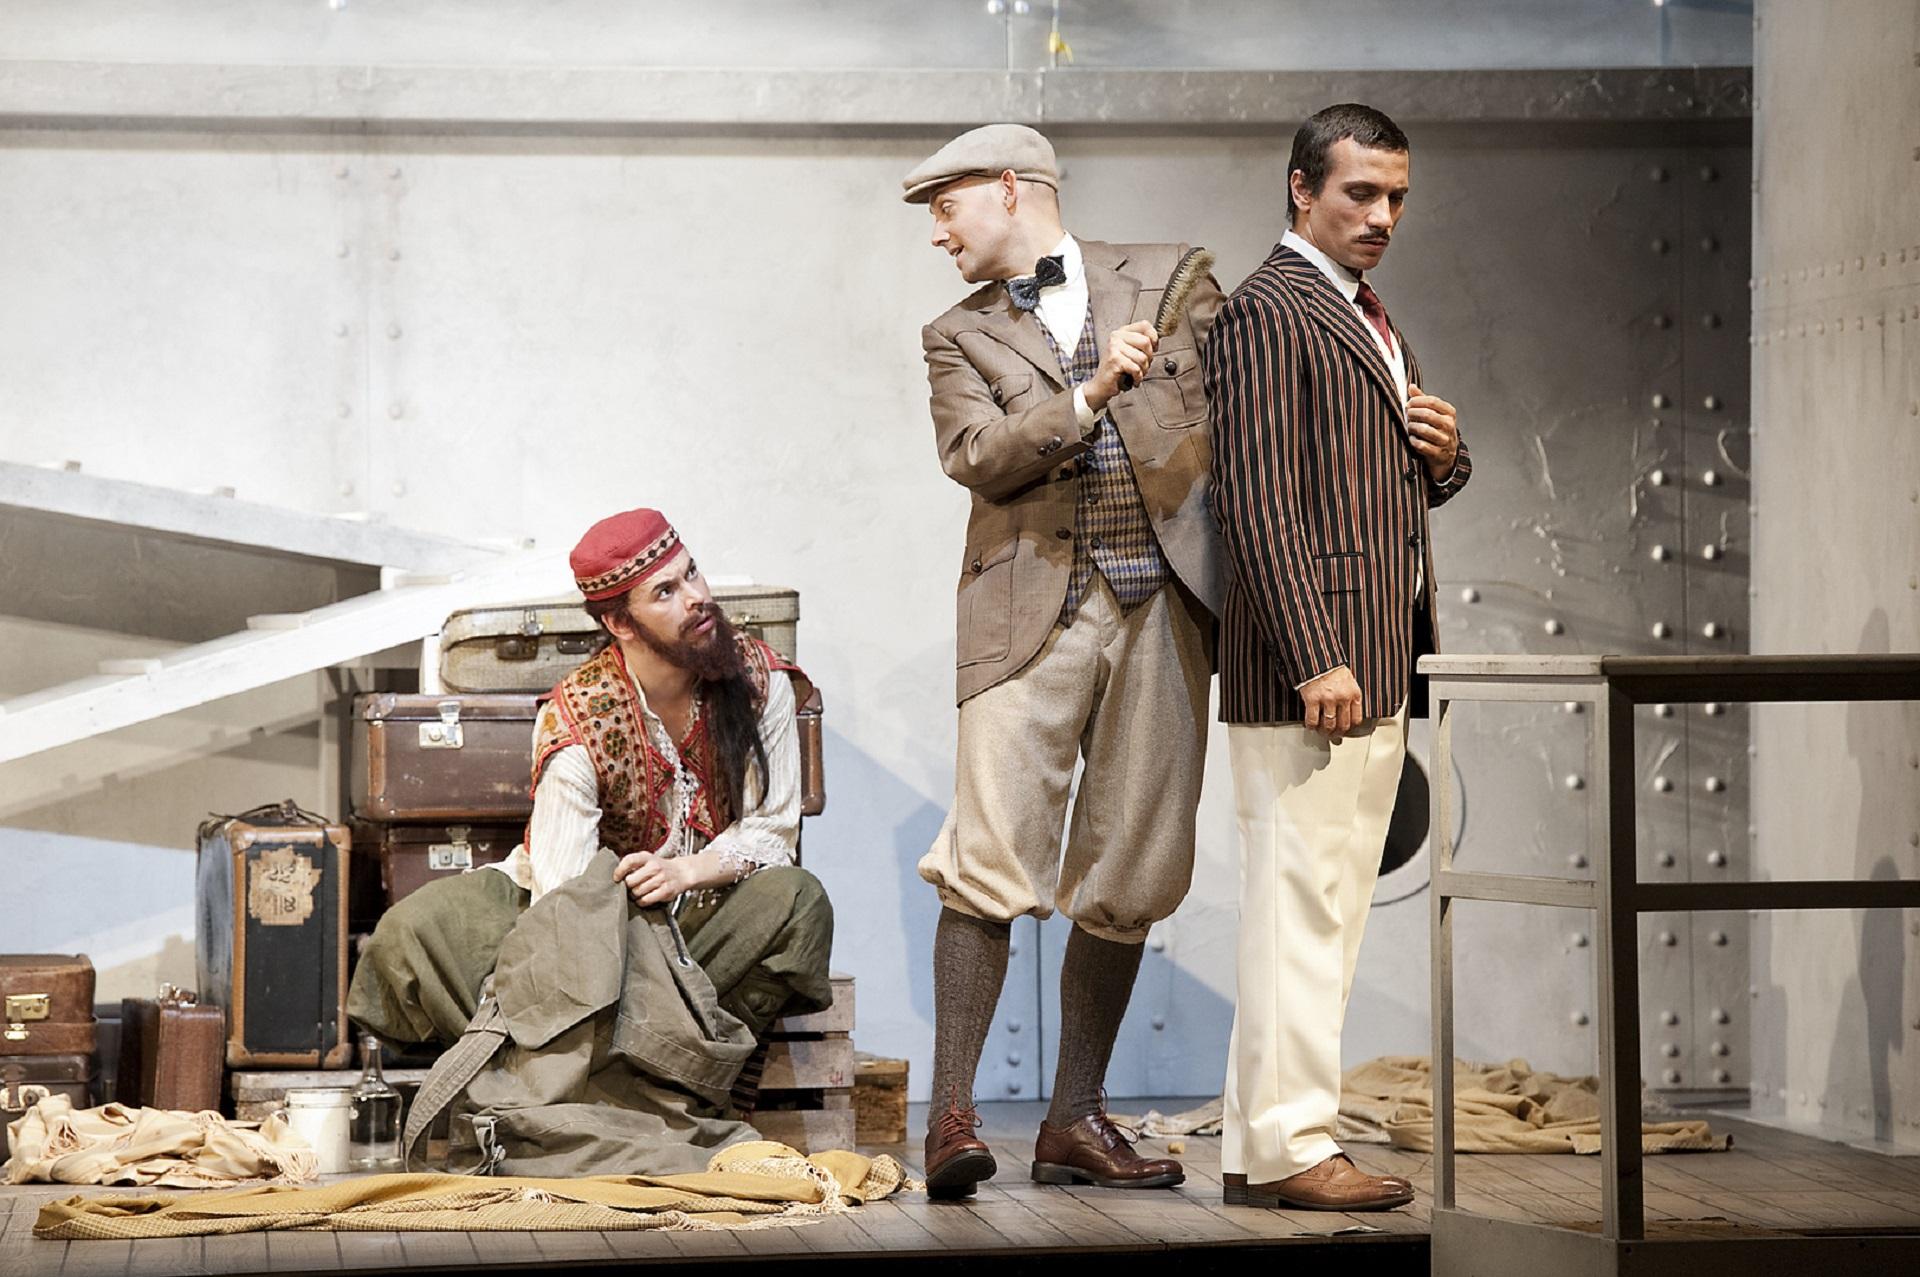 Pilger-Von-Mekka-Opera-Stage-Director-Jacopo-Spirei-2